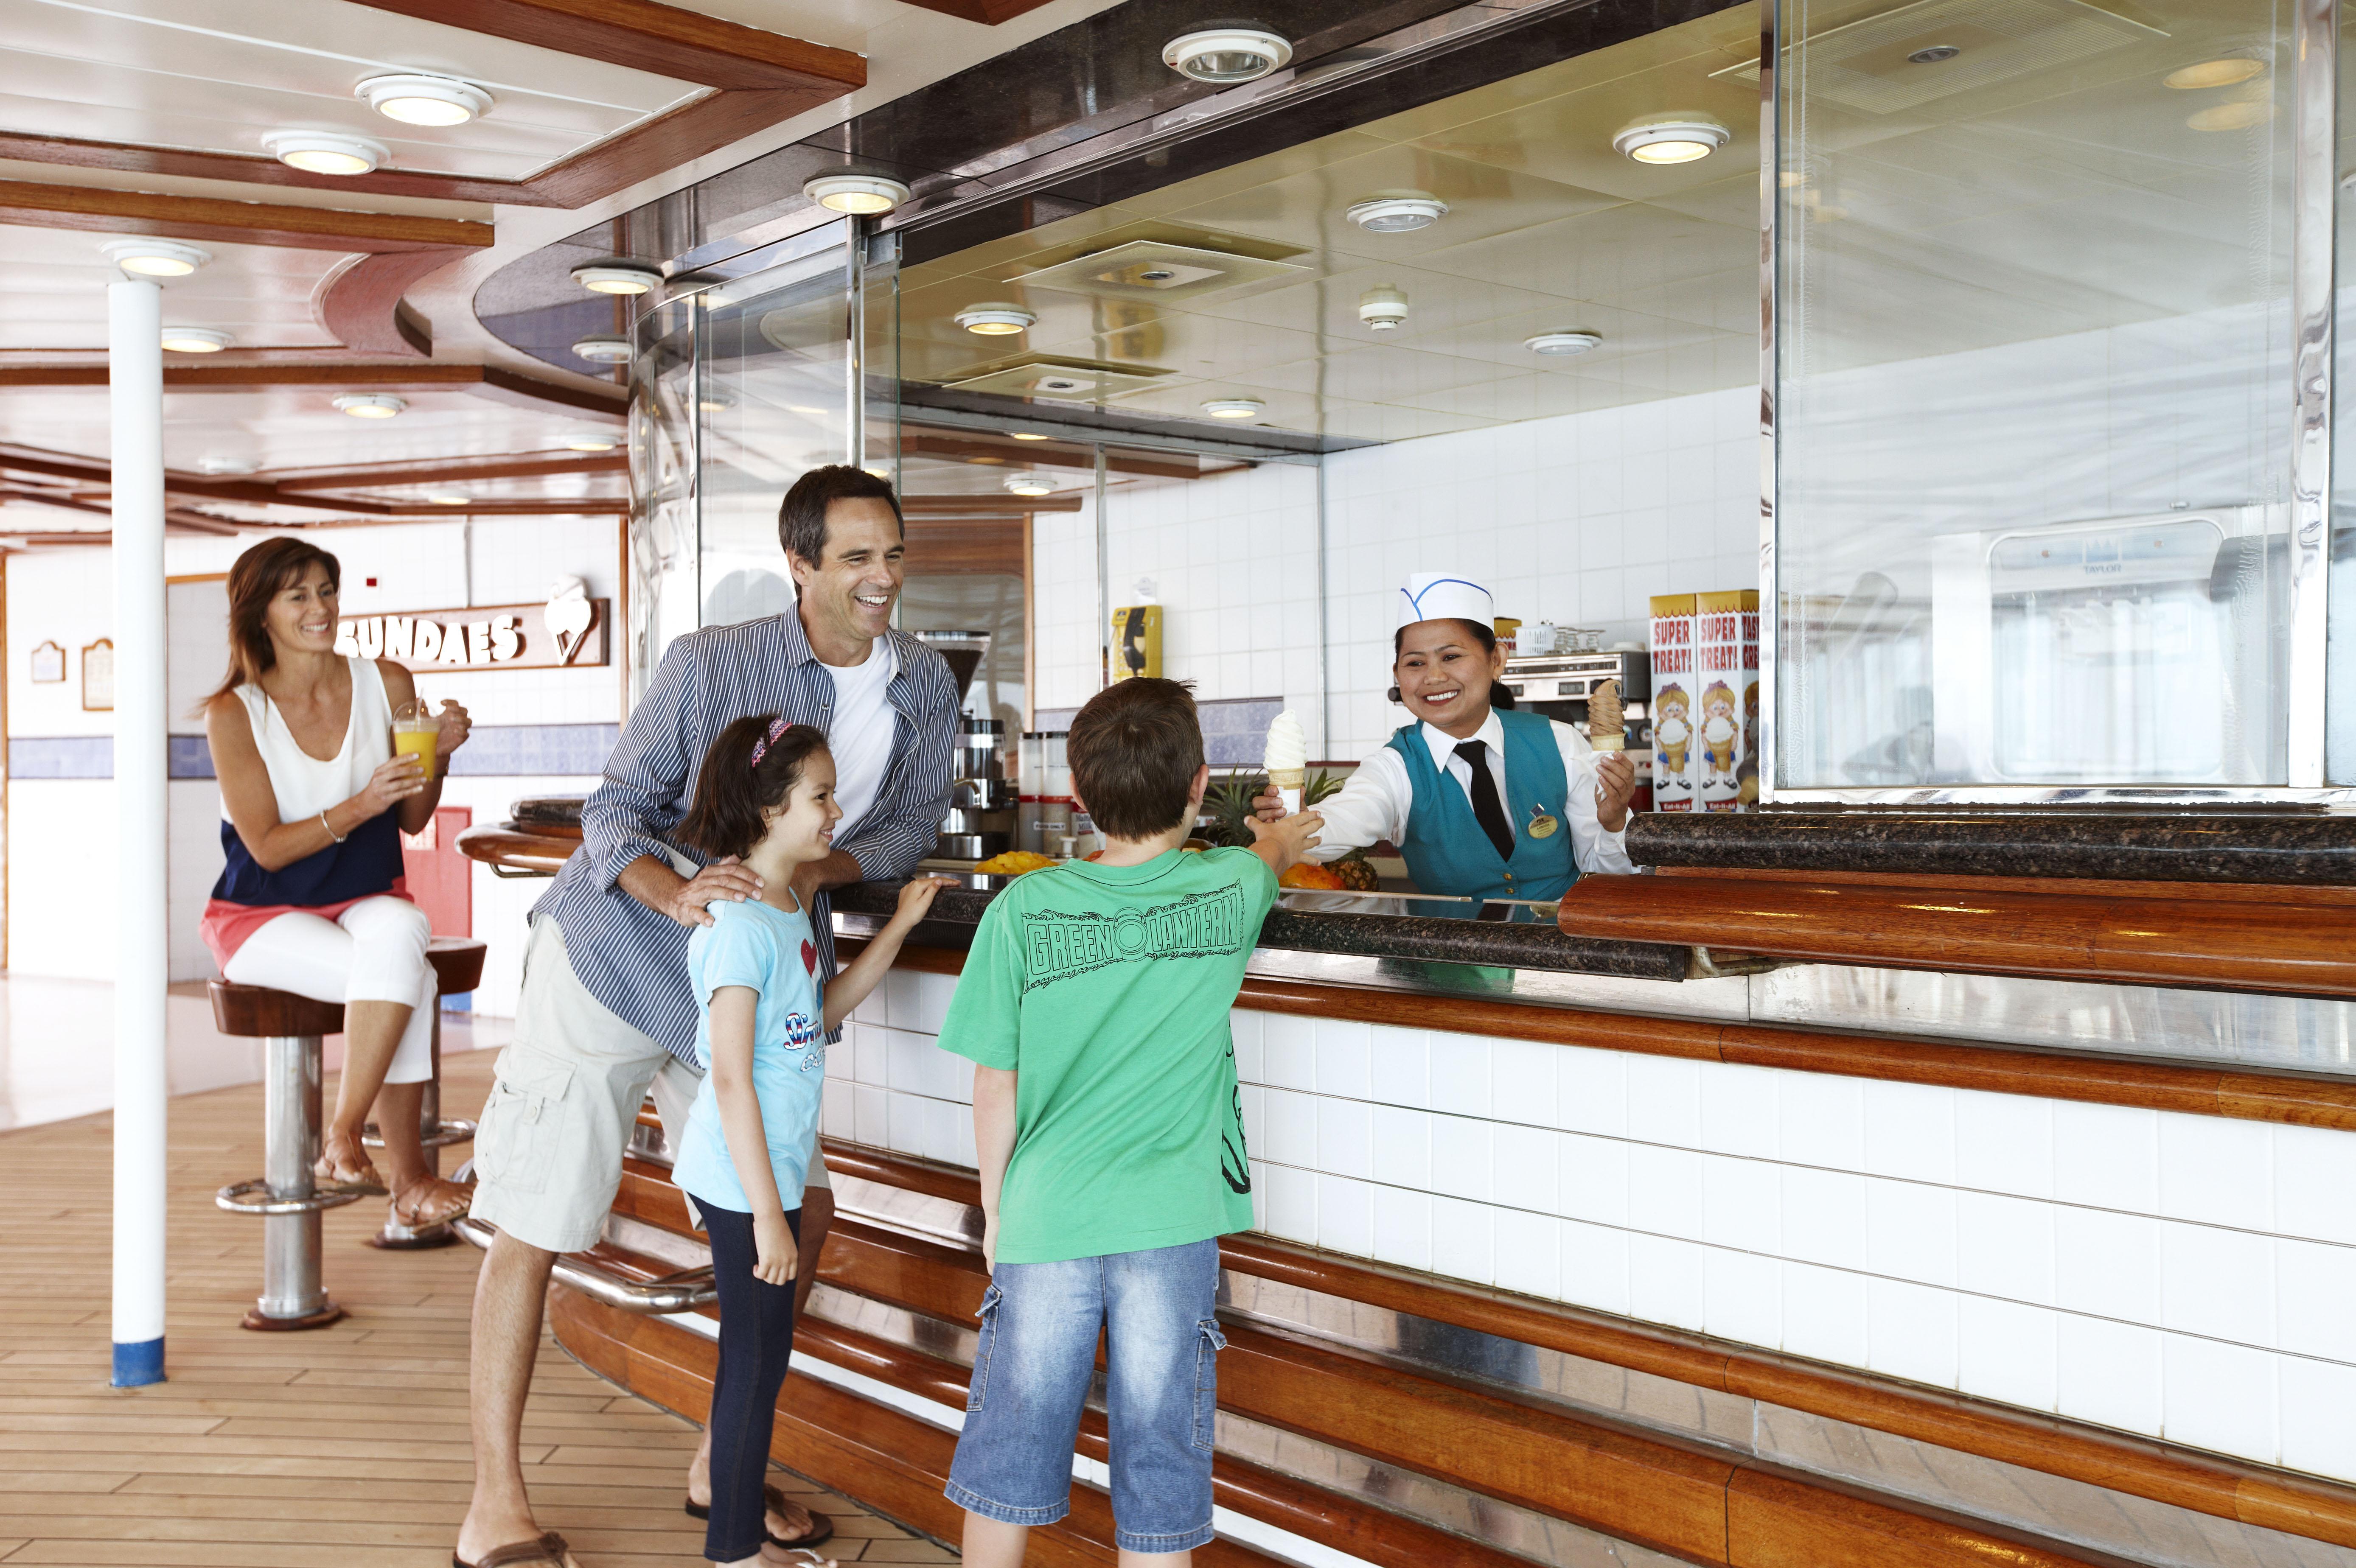 Princess Cruises Coral Class casual dining 2.jpg